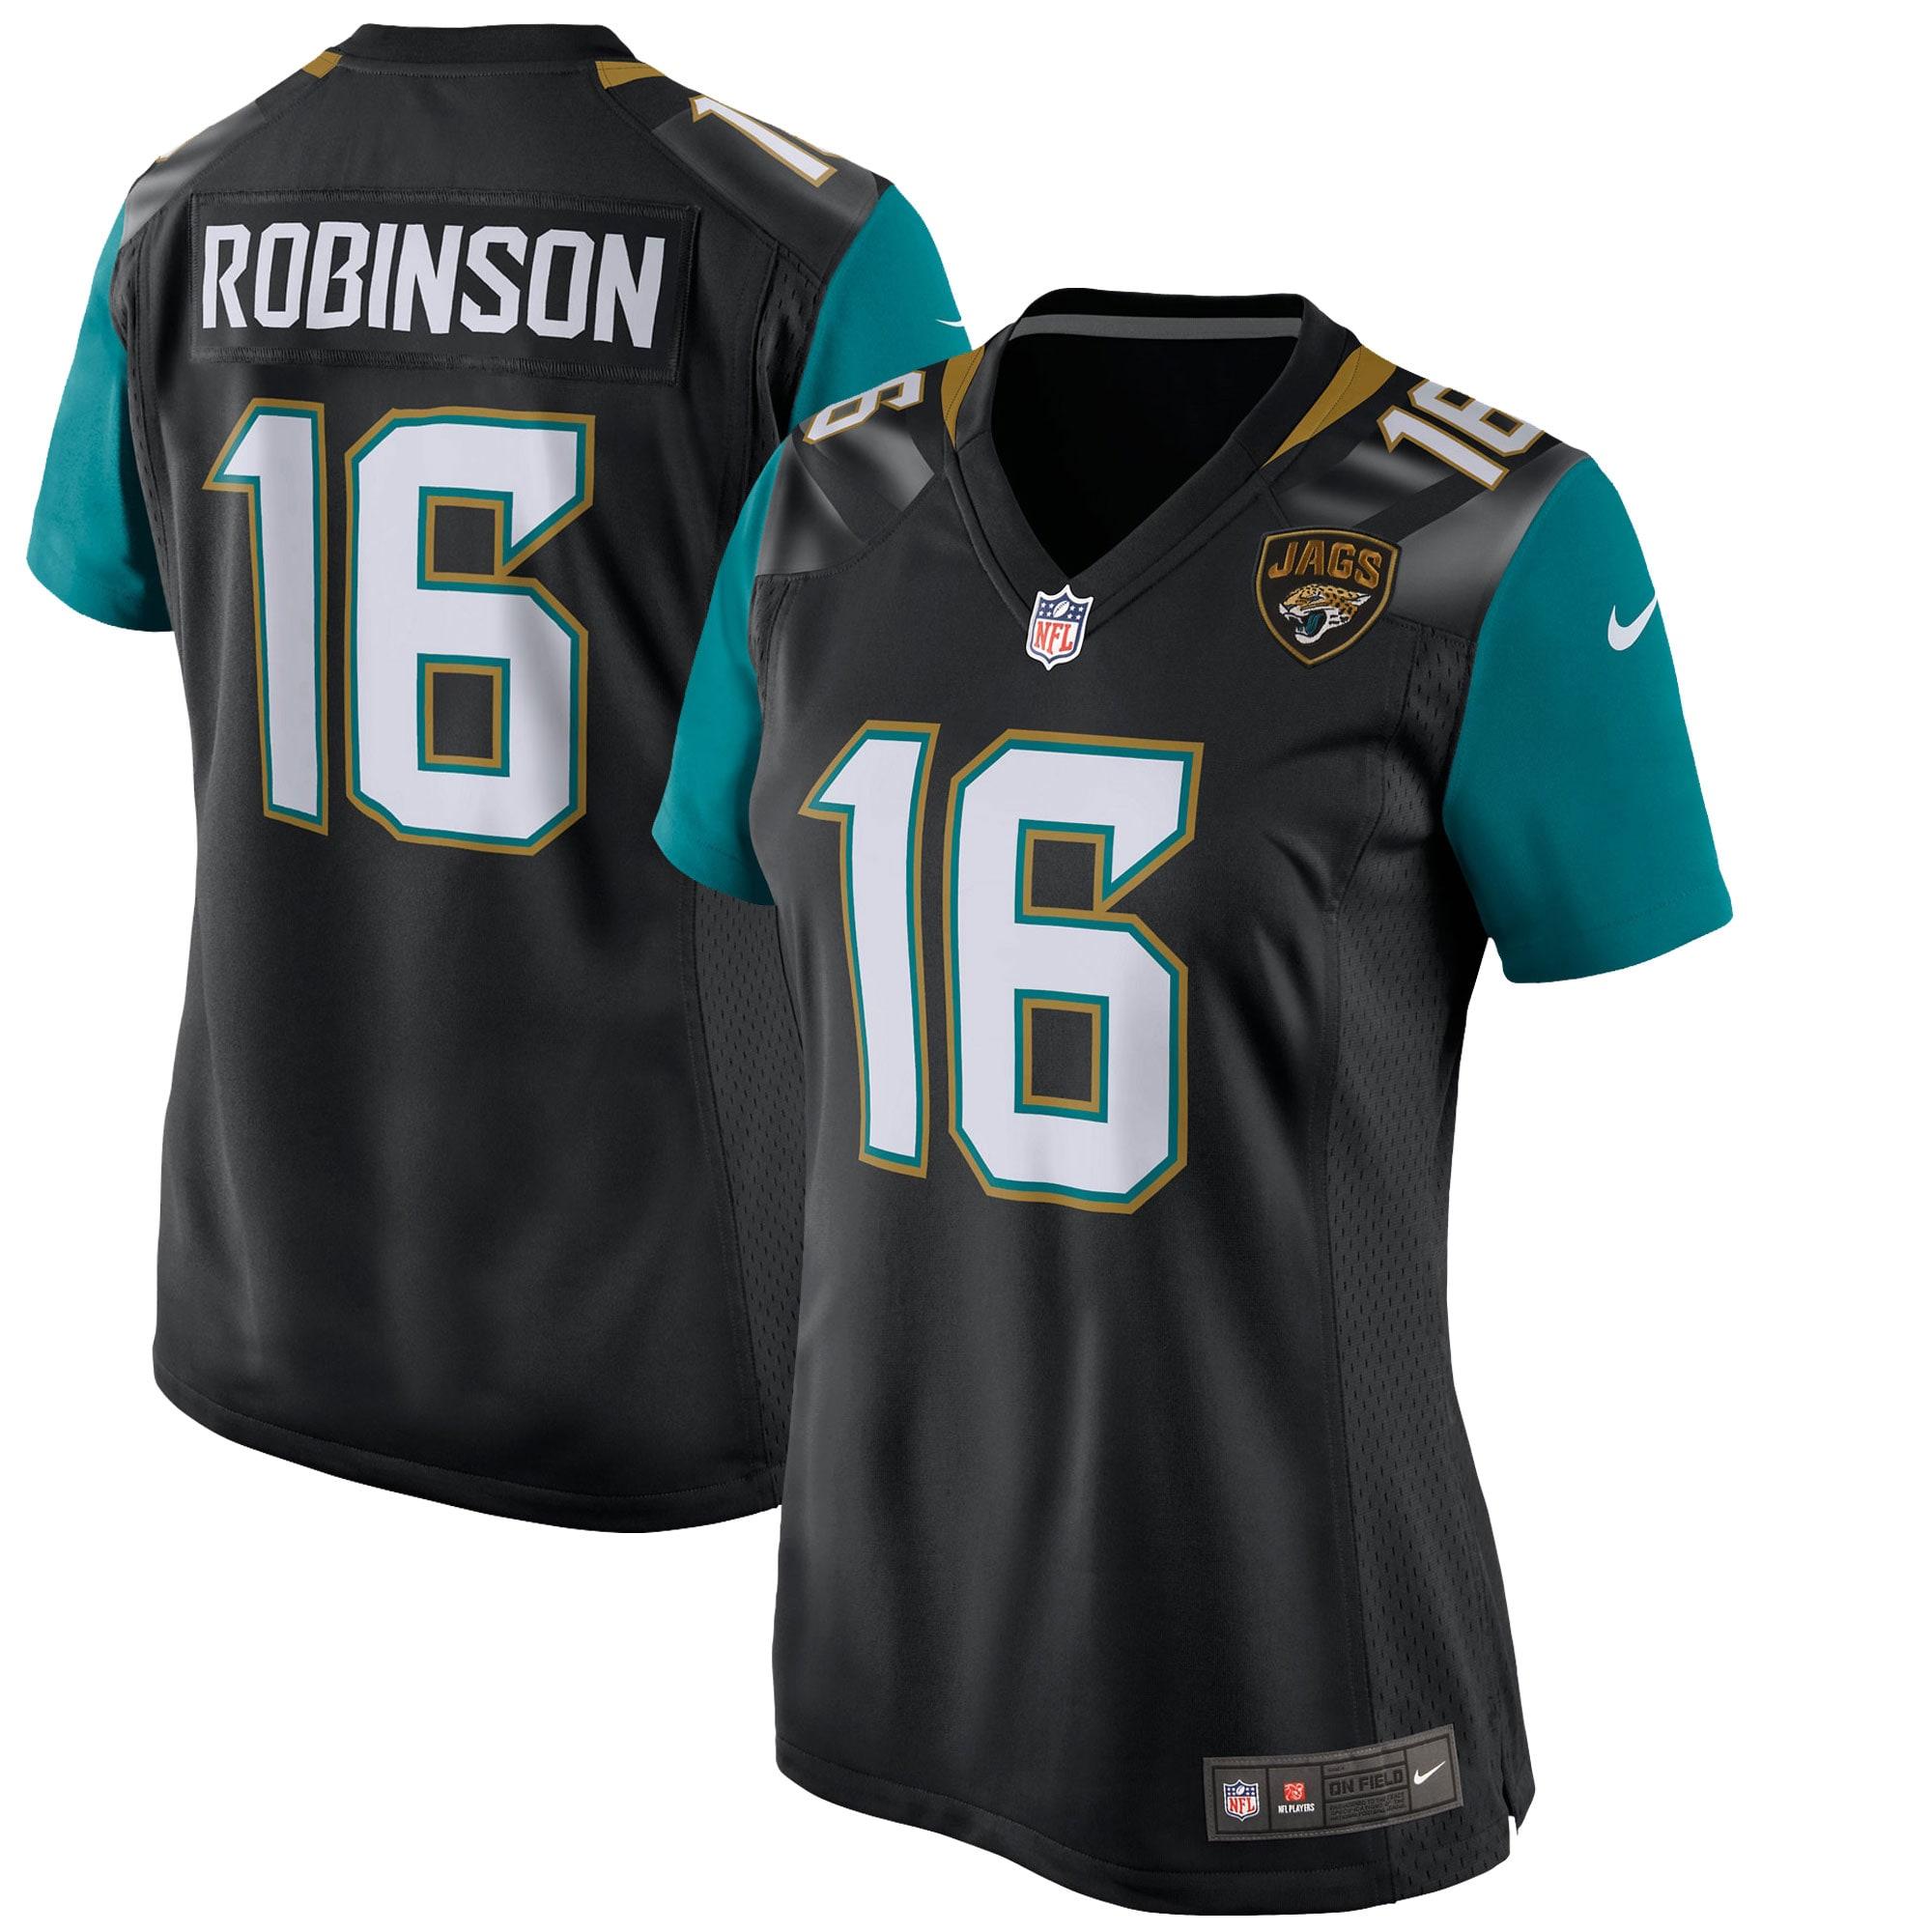 Denard Robinson Jacksonville Jaguars Nike Women's Game Jersey - Black